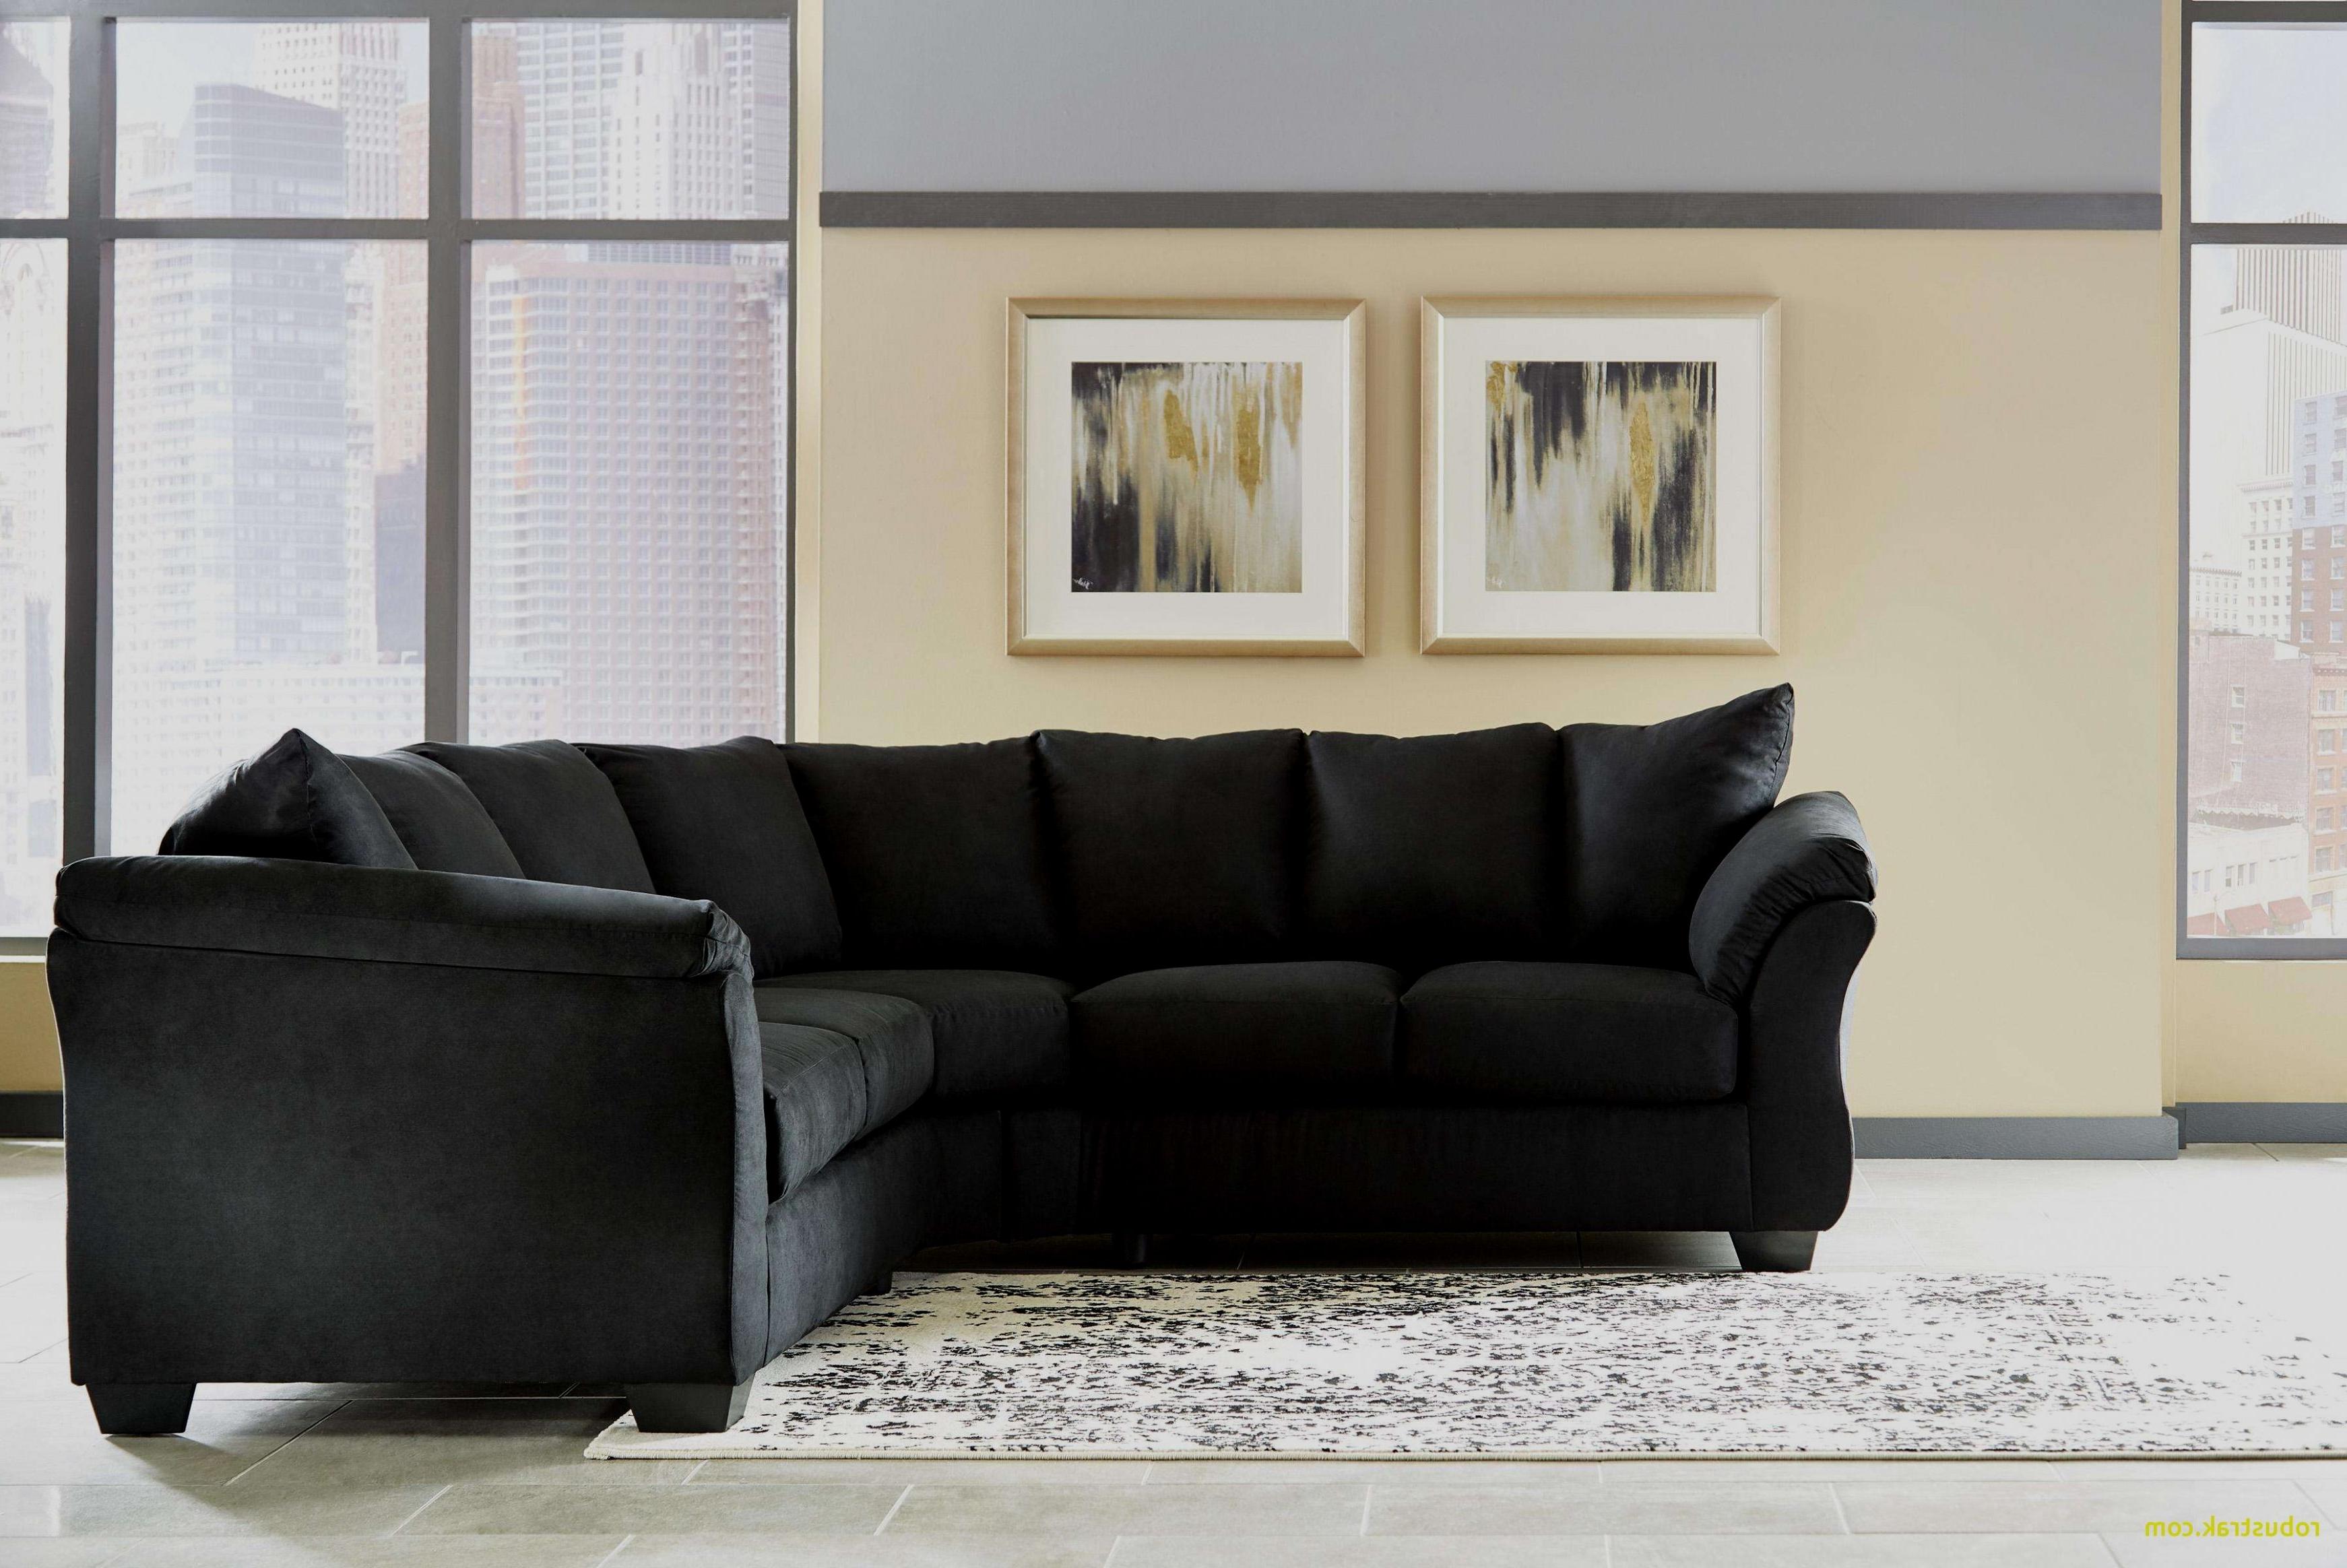 Venta De sofas Online Ipdd Venta sofas Online Encantador Rooms to Go sofa Tables